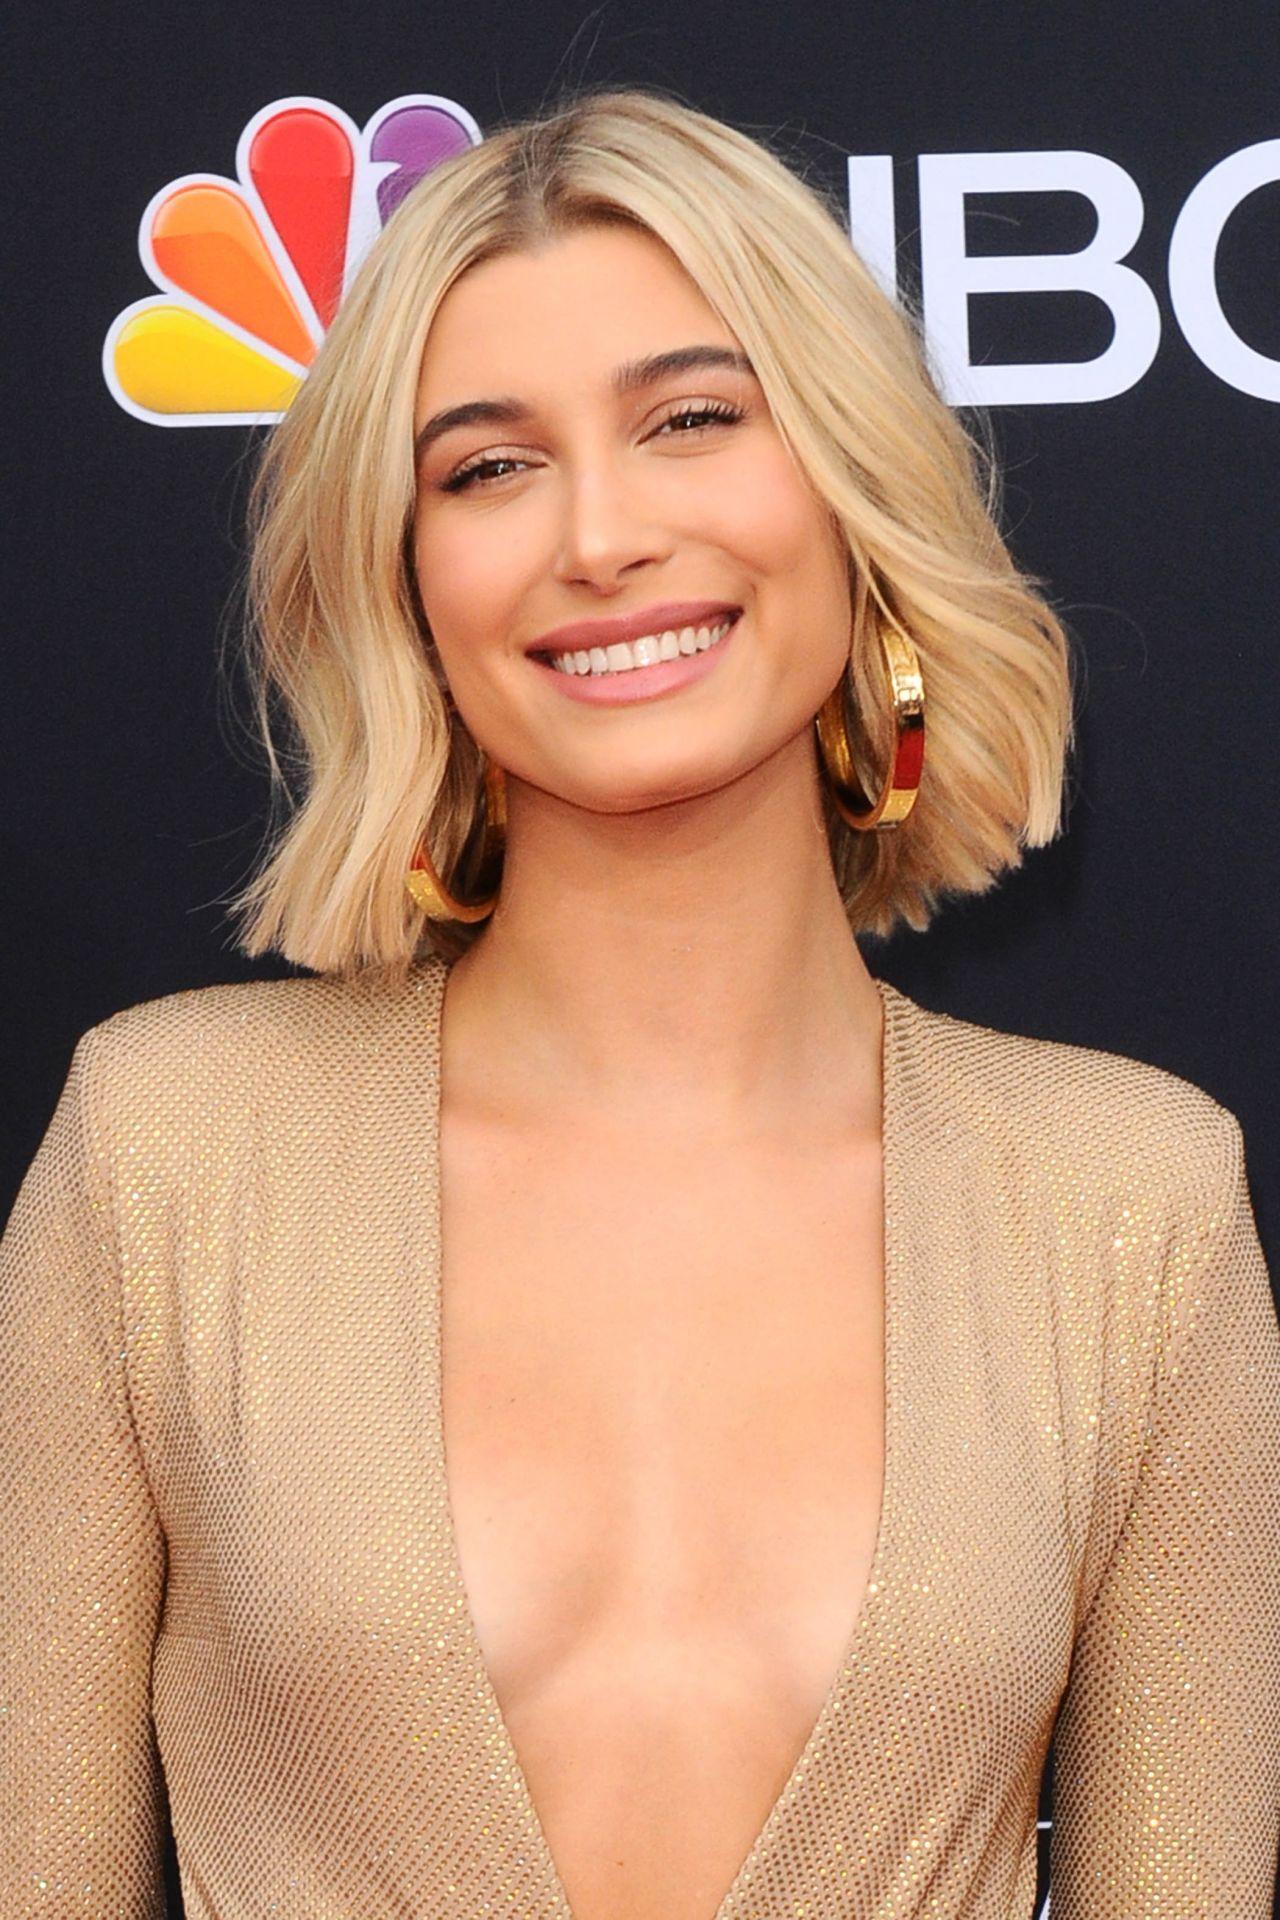 Http Celebmafia Com Wp Content Uploads 2018 05 Hailey Baldwin 2018 Billboard Music Awards In Las Celebrity Short Hair Short Hair Styles Celebrity Hairstyles